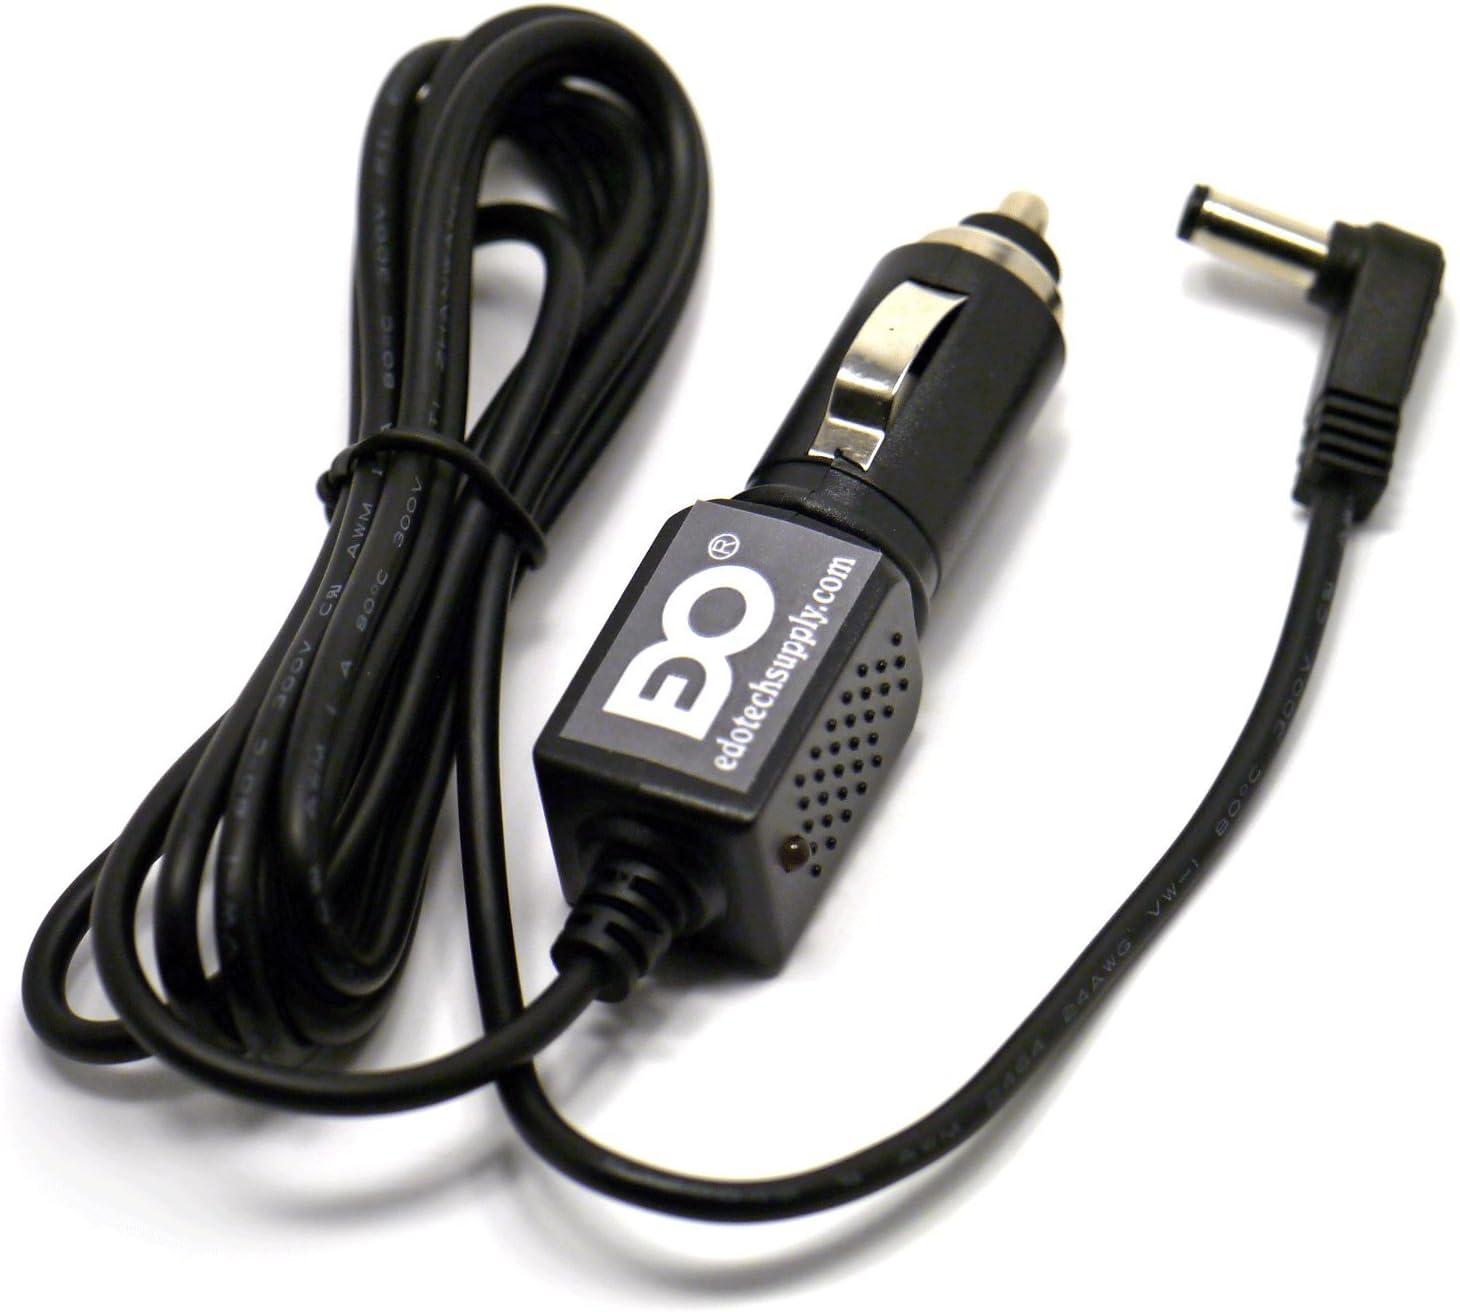 EDO Tech 12V DC Car Charger Power Adapter Cord for Garmin Street Pilot C310 C320 C330 C340 GPS System